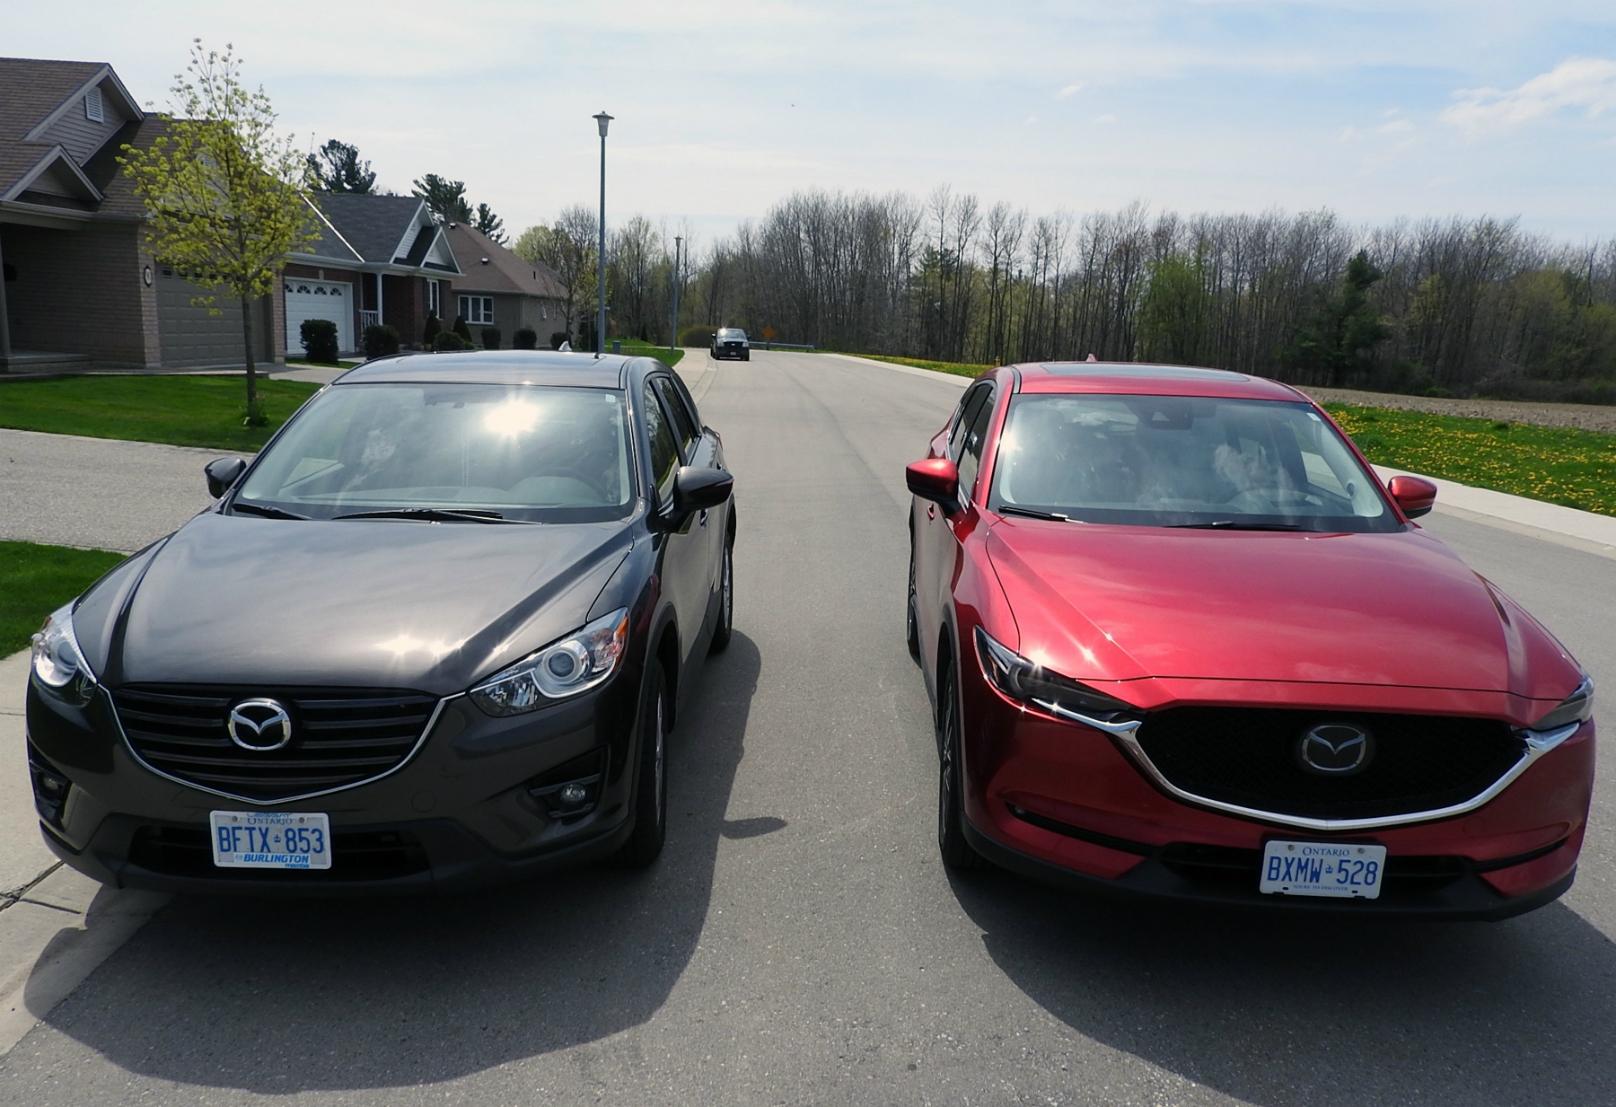 http://s3.amazonaws.com/images.wheels.ca/wp-content/uploads/2017/05/Mazda-CX-5-2017-comparo.jpg